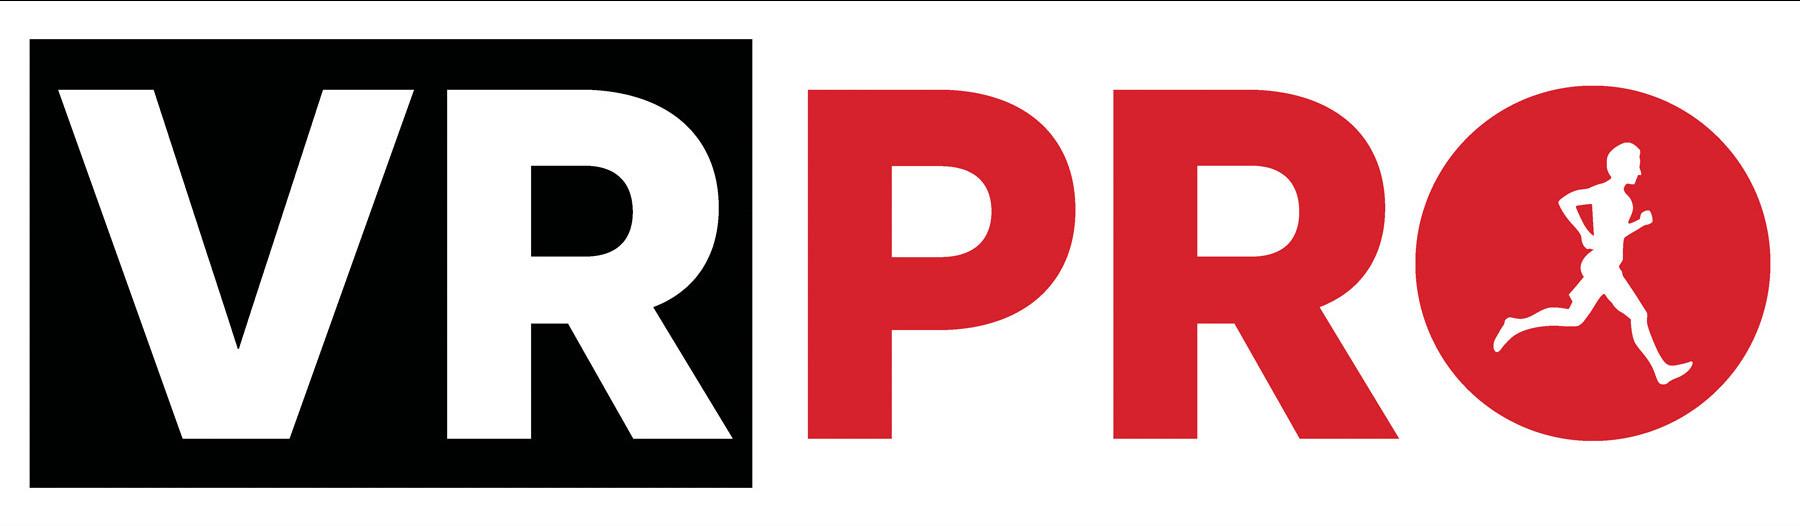 VR PRO Inc.